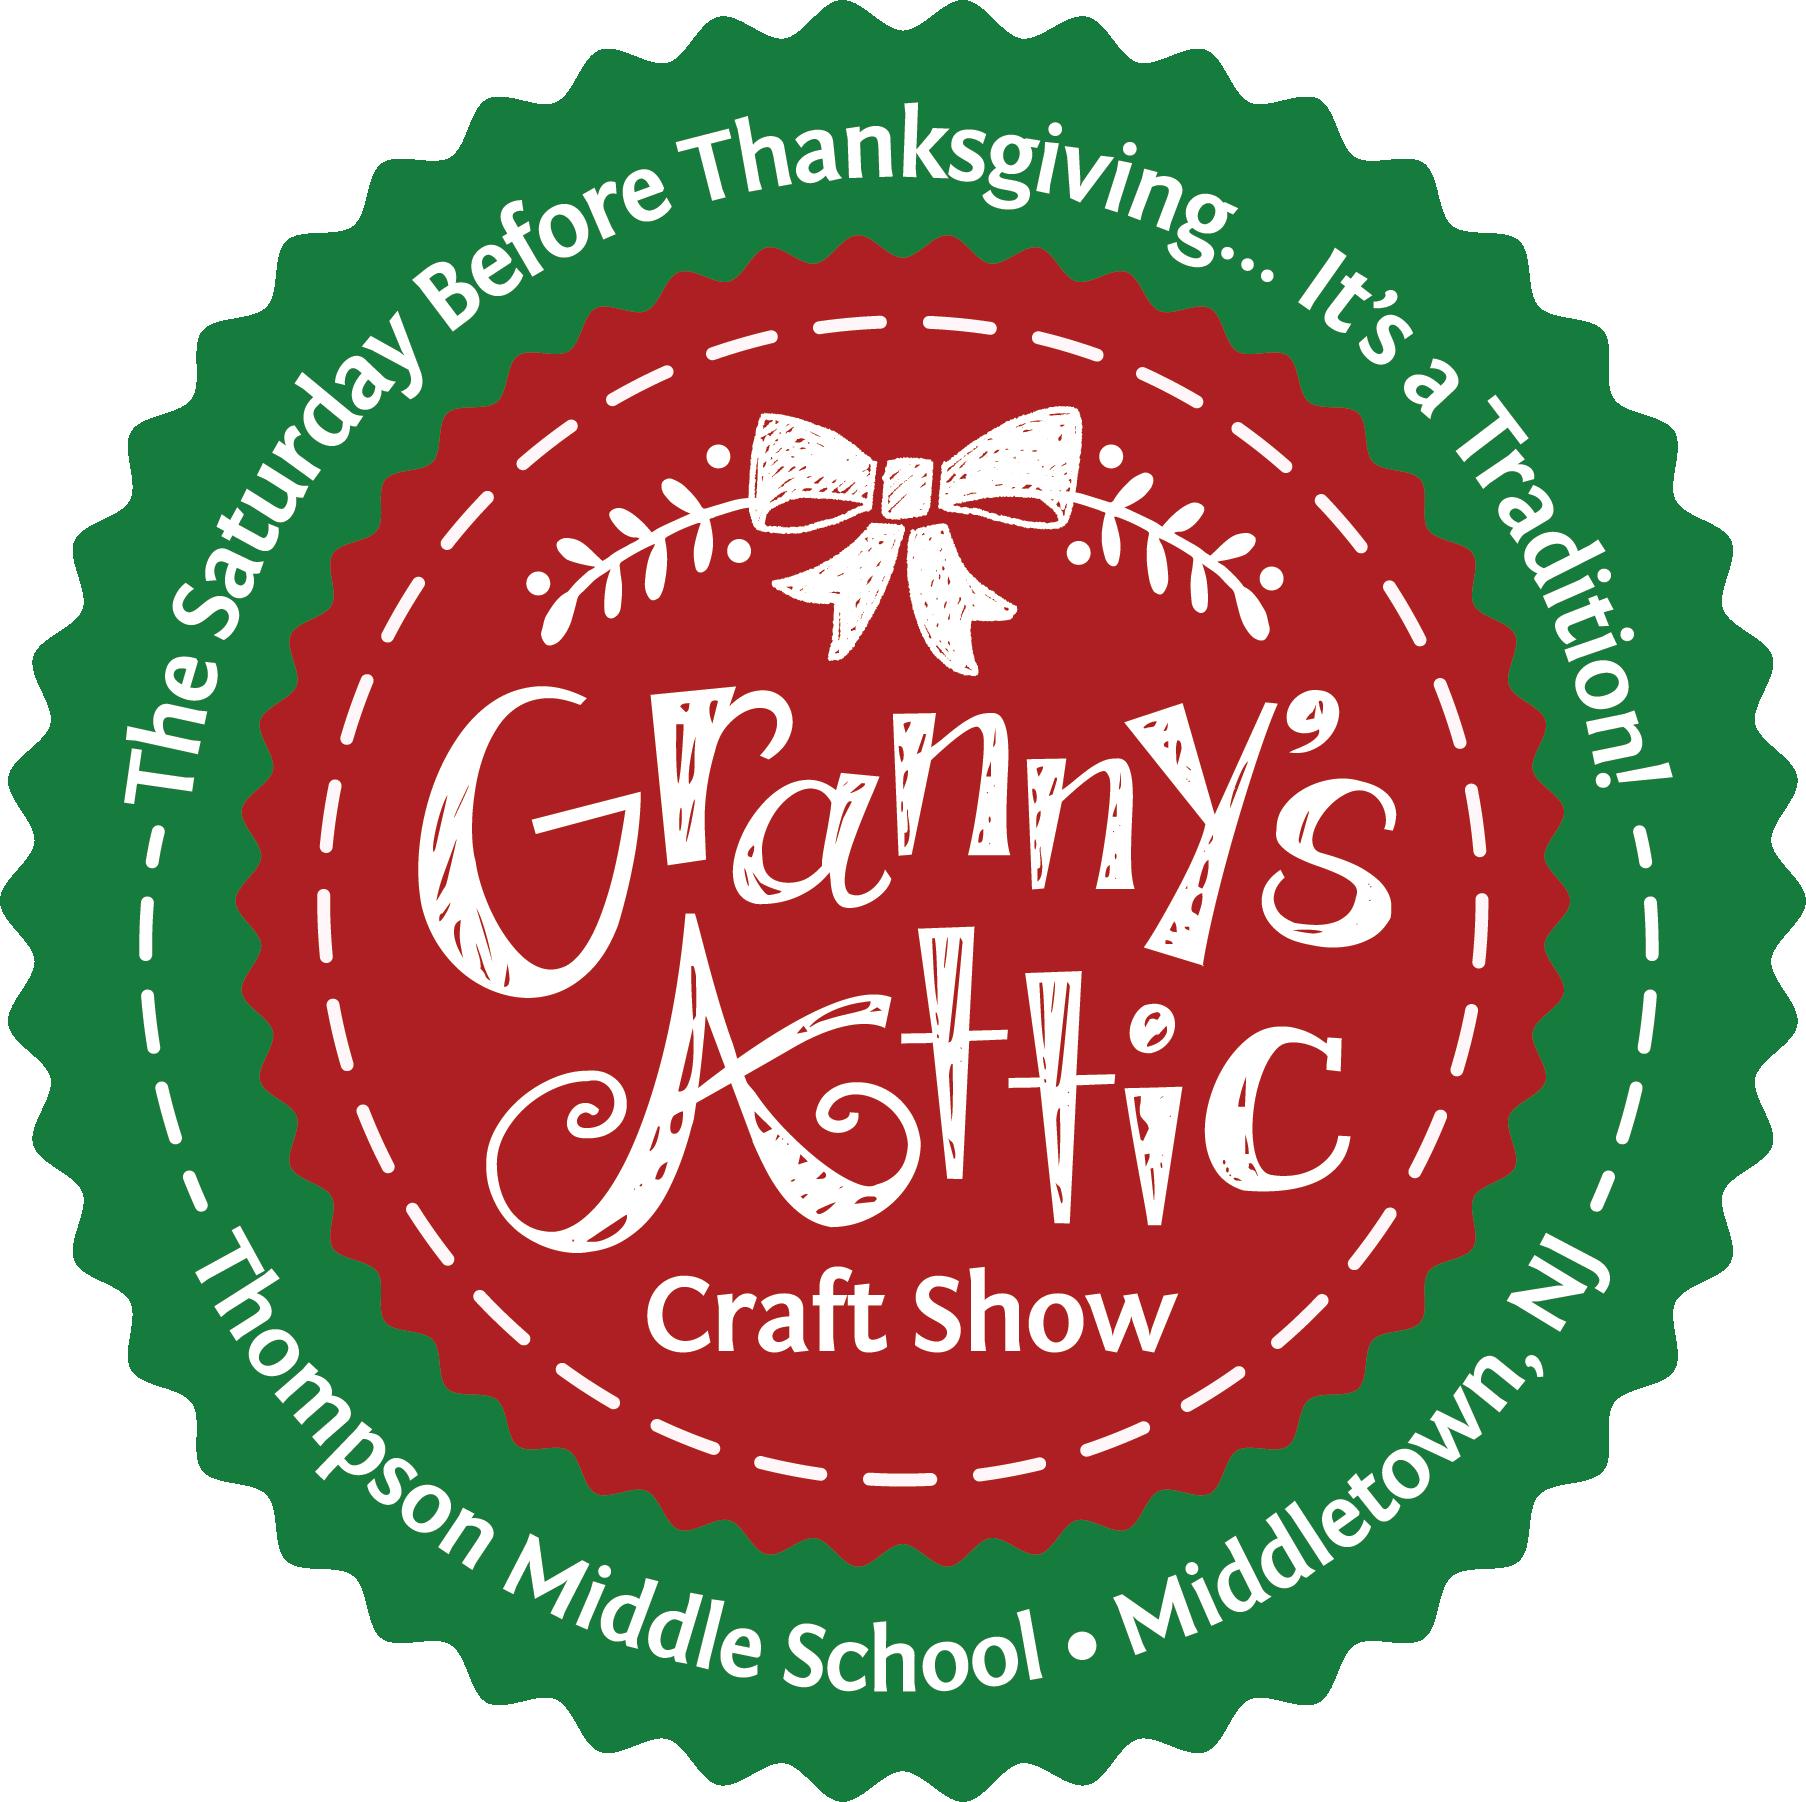 Granny's Attic Online Registration for 11/20/21